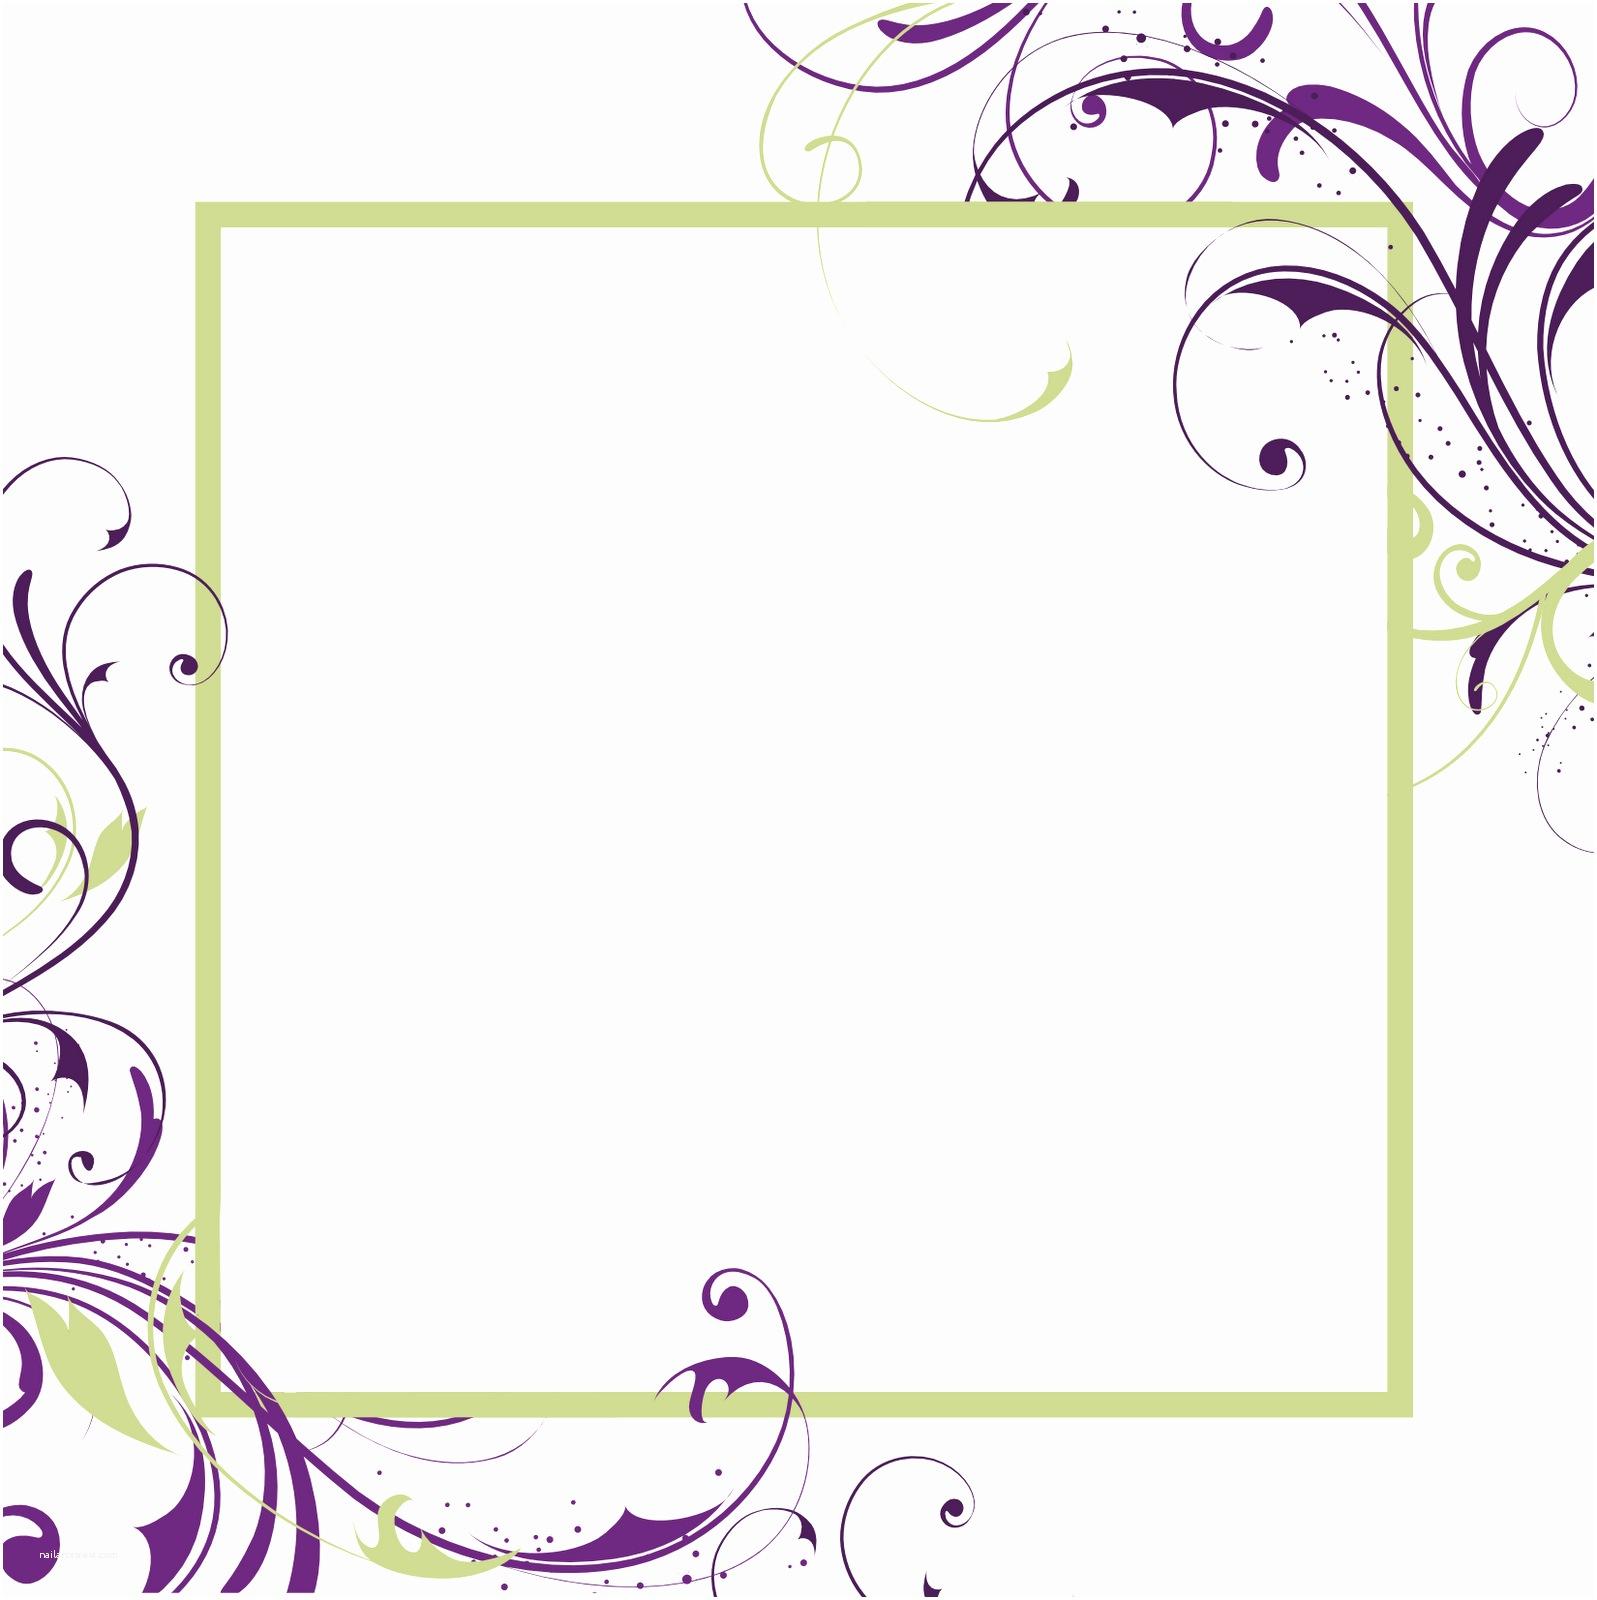 Free Printable Wedding Invitation Templates for Microsoft Word Free Printable Blank Invitations Templates